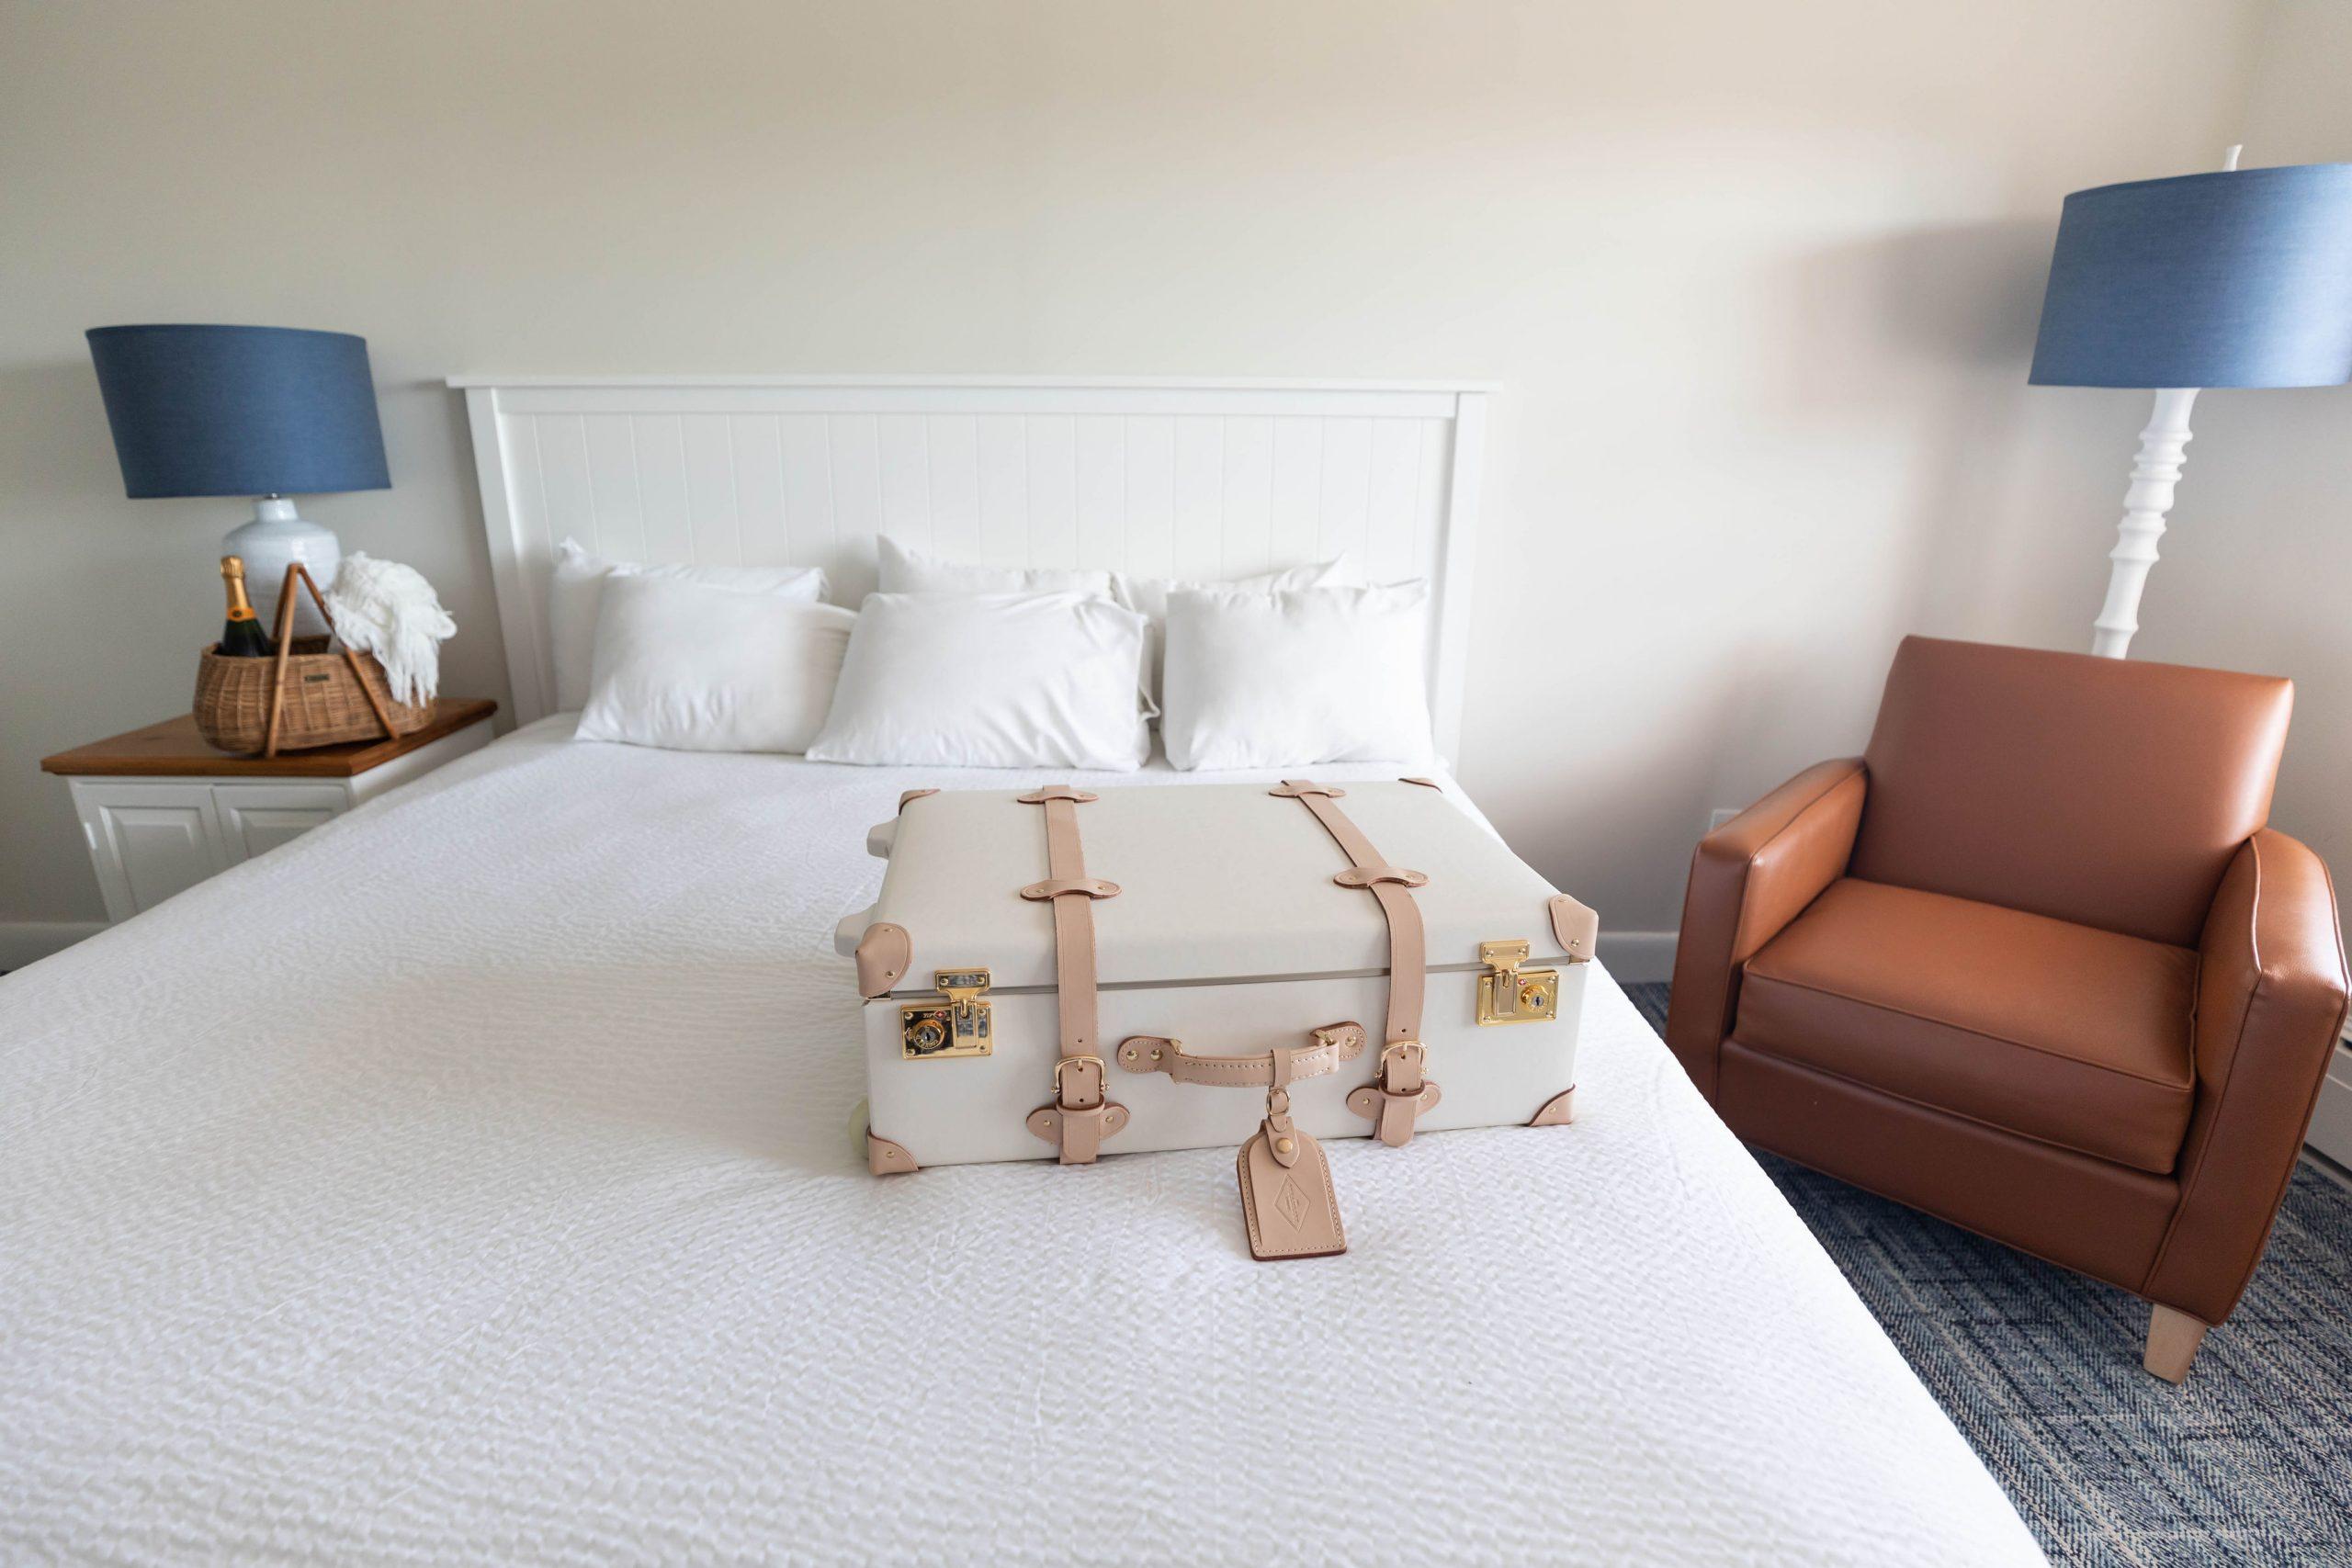 Straits View King Room at Straits Lodge at Mission Point Resort on Mackinac Island Michigan by Annie Fairfax @AnnieFairfax